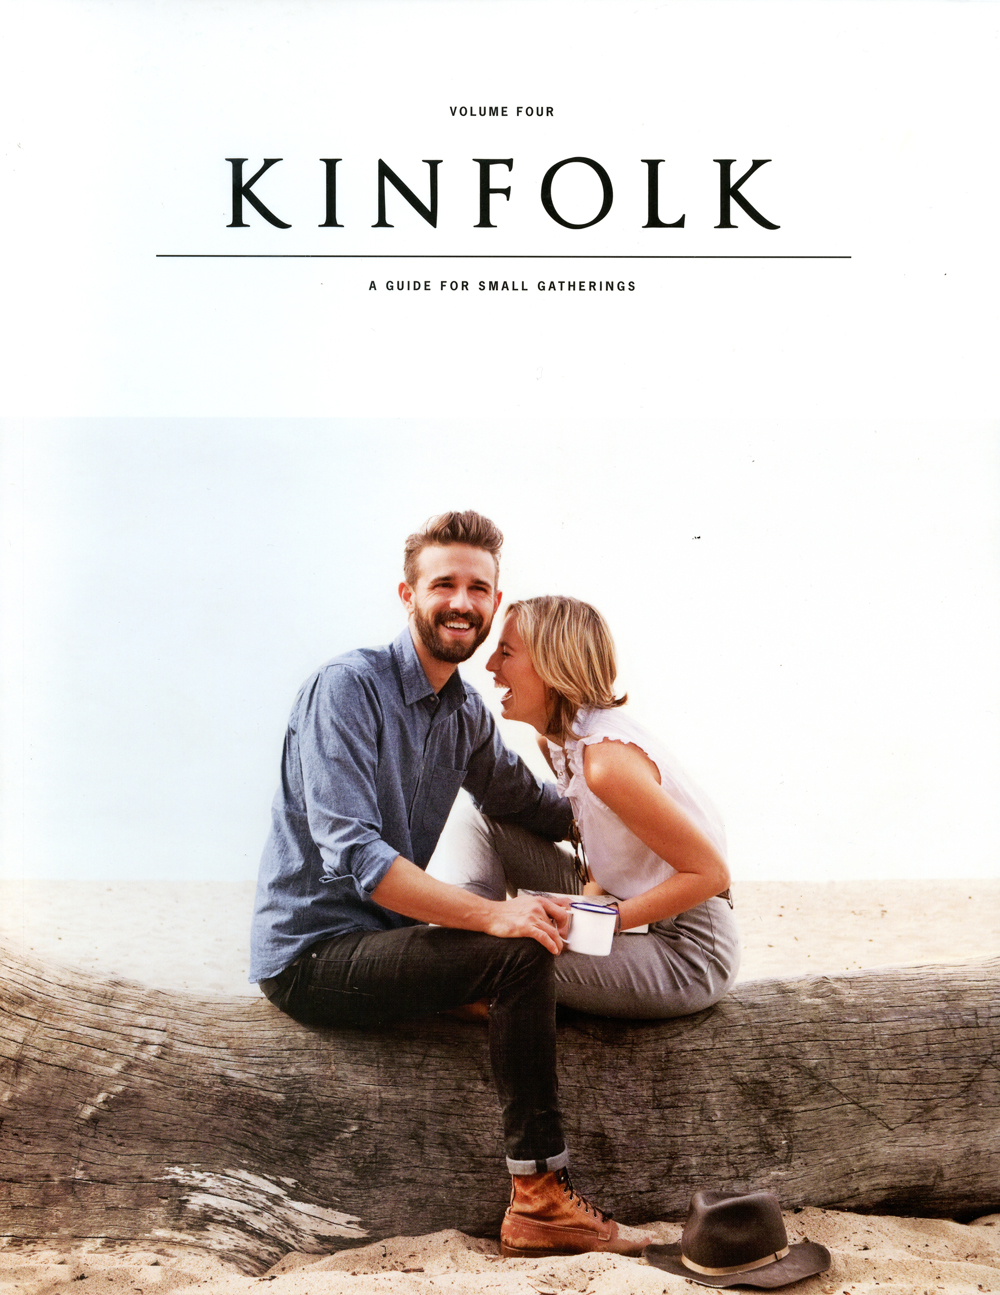 kinfolk, volume 4 - scan 1.jpg